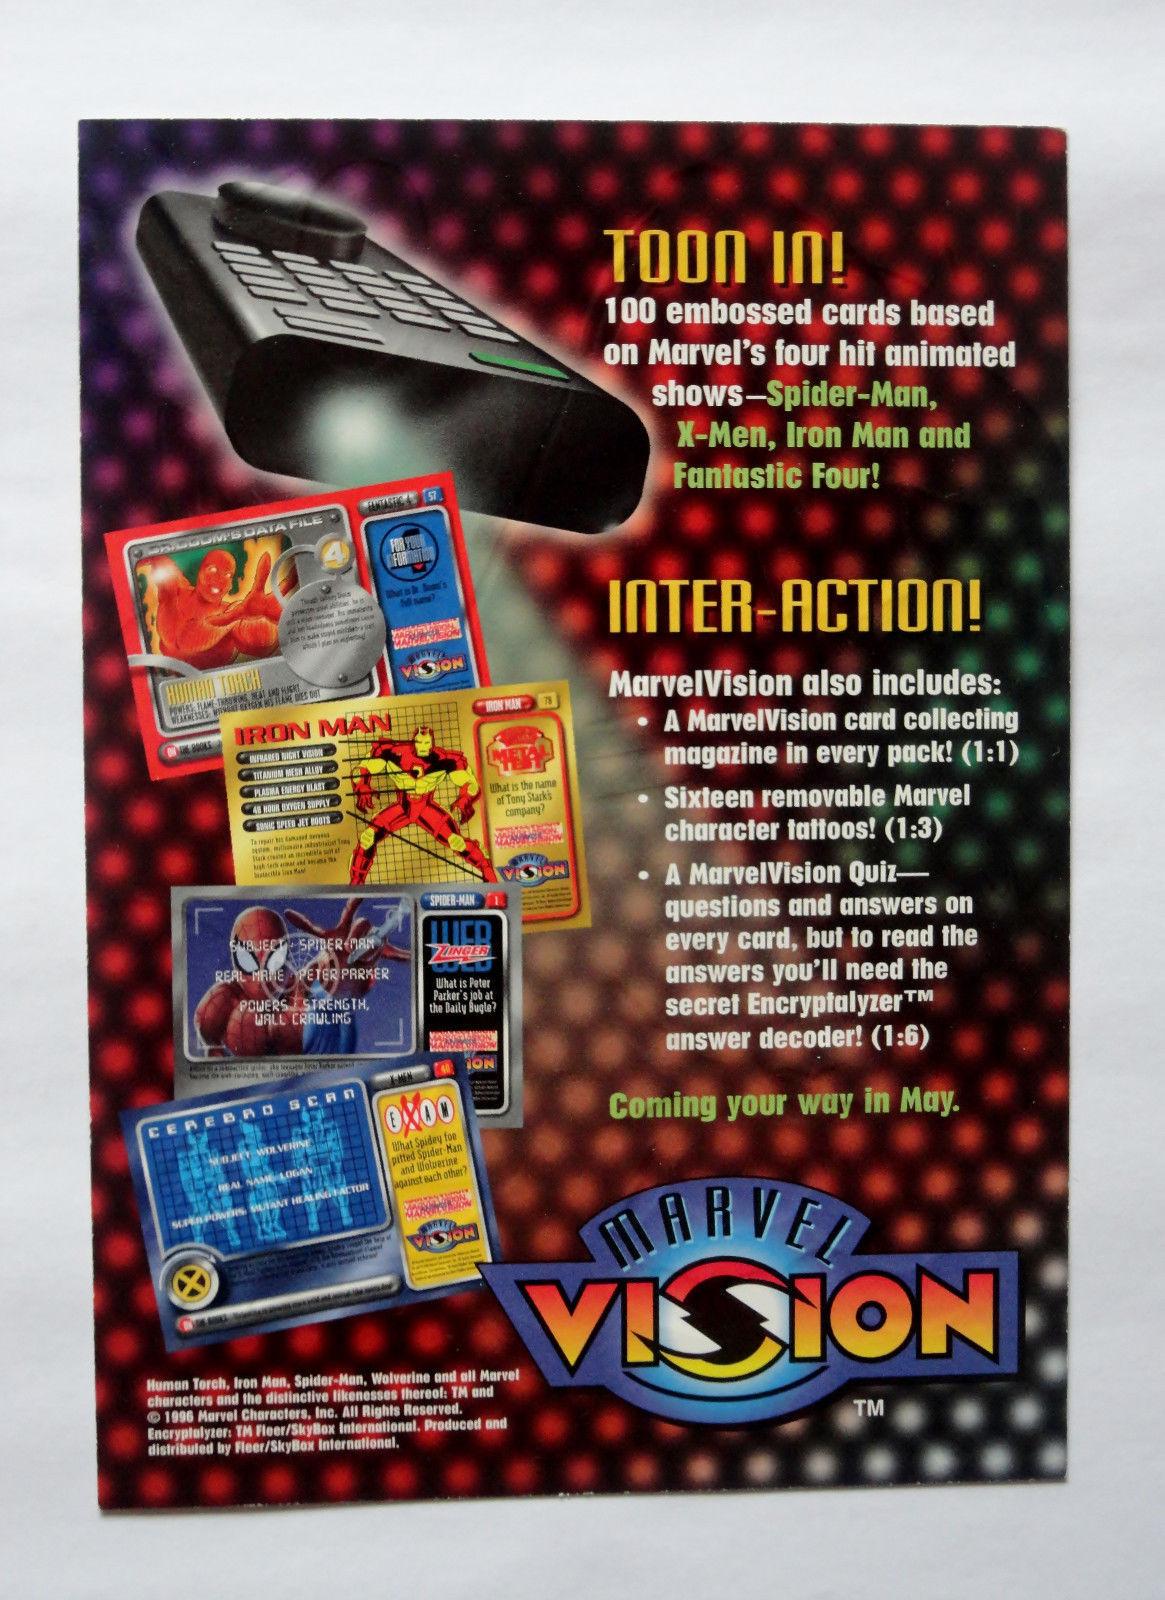 Cards Marvel 1996 Vision Fleer Uncut Promo Sheet Spiderman Wolverine Iron Man image 2